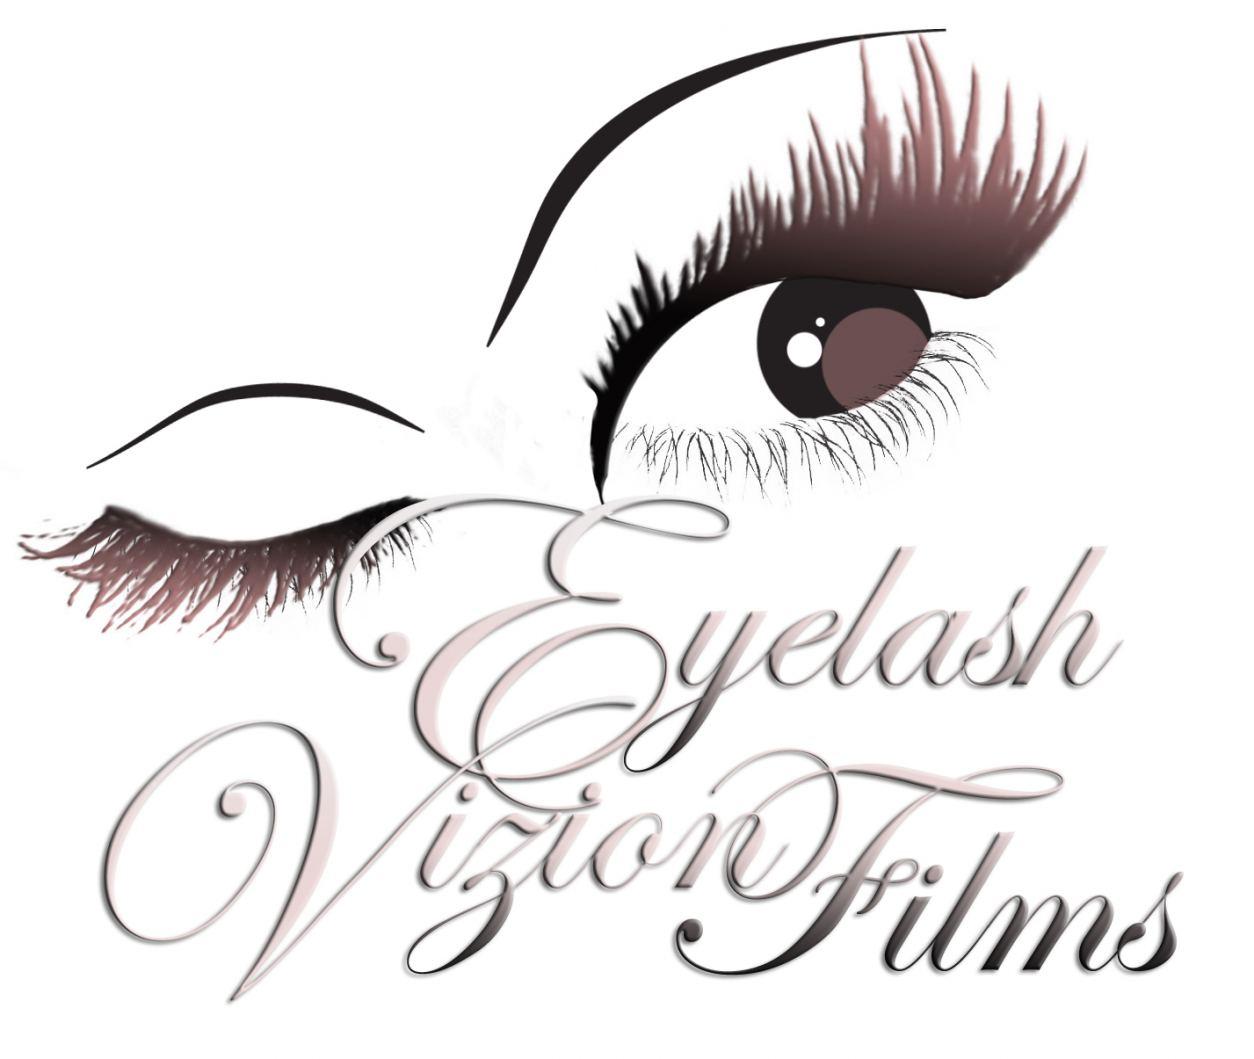 Film & Production